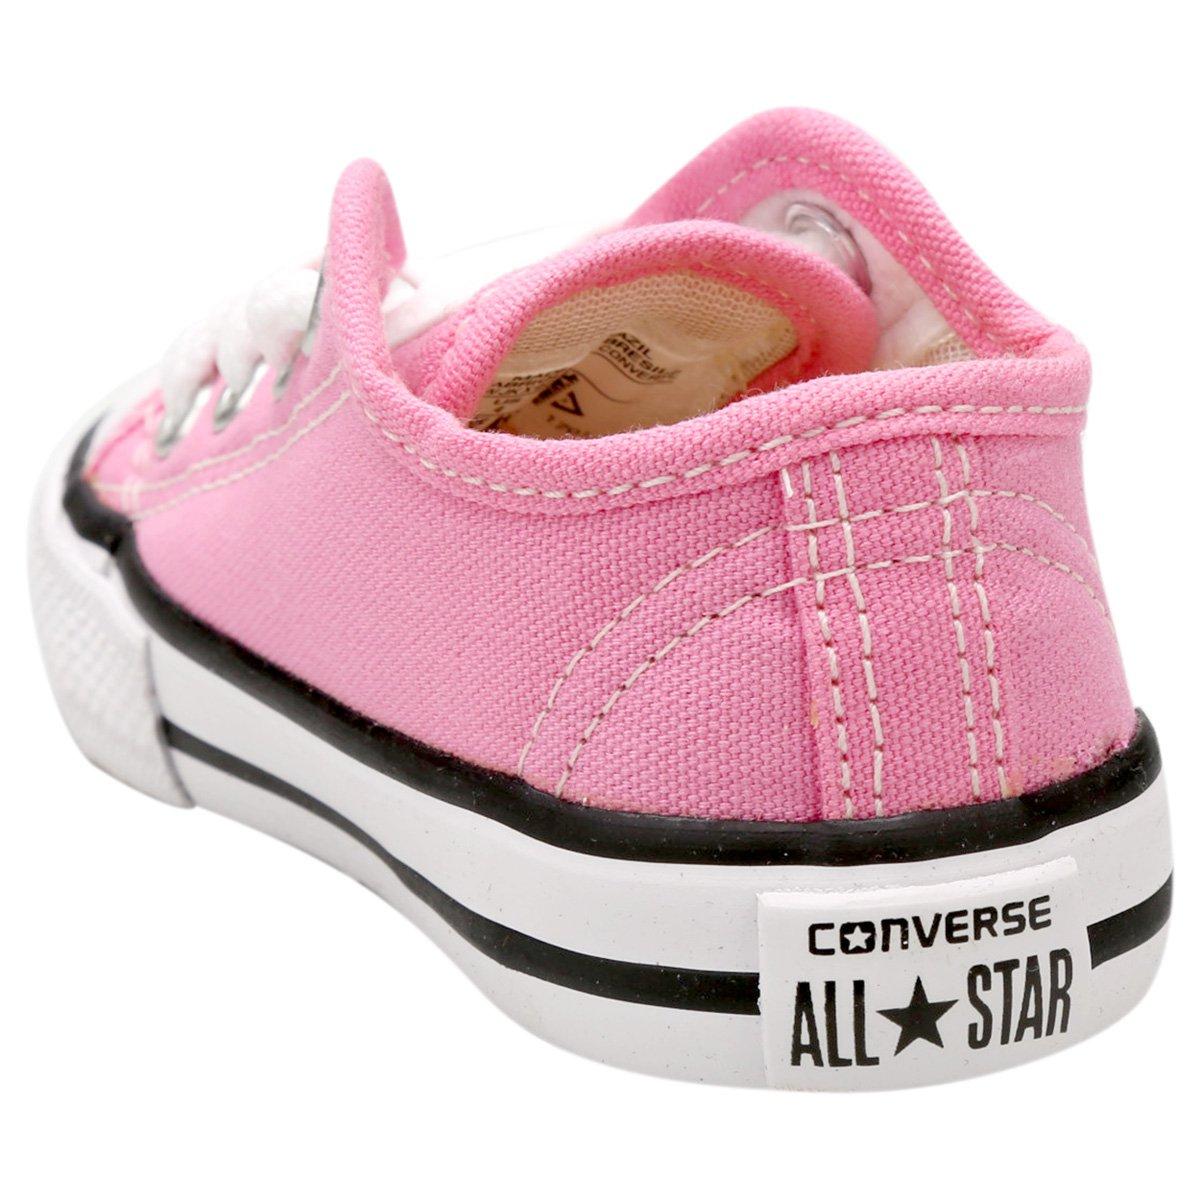 00af2e92554 Tênis Infantil Converse All Star Chuck Taylor Border Baby